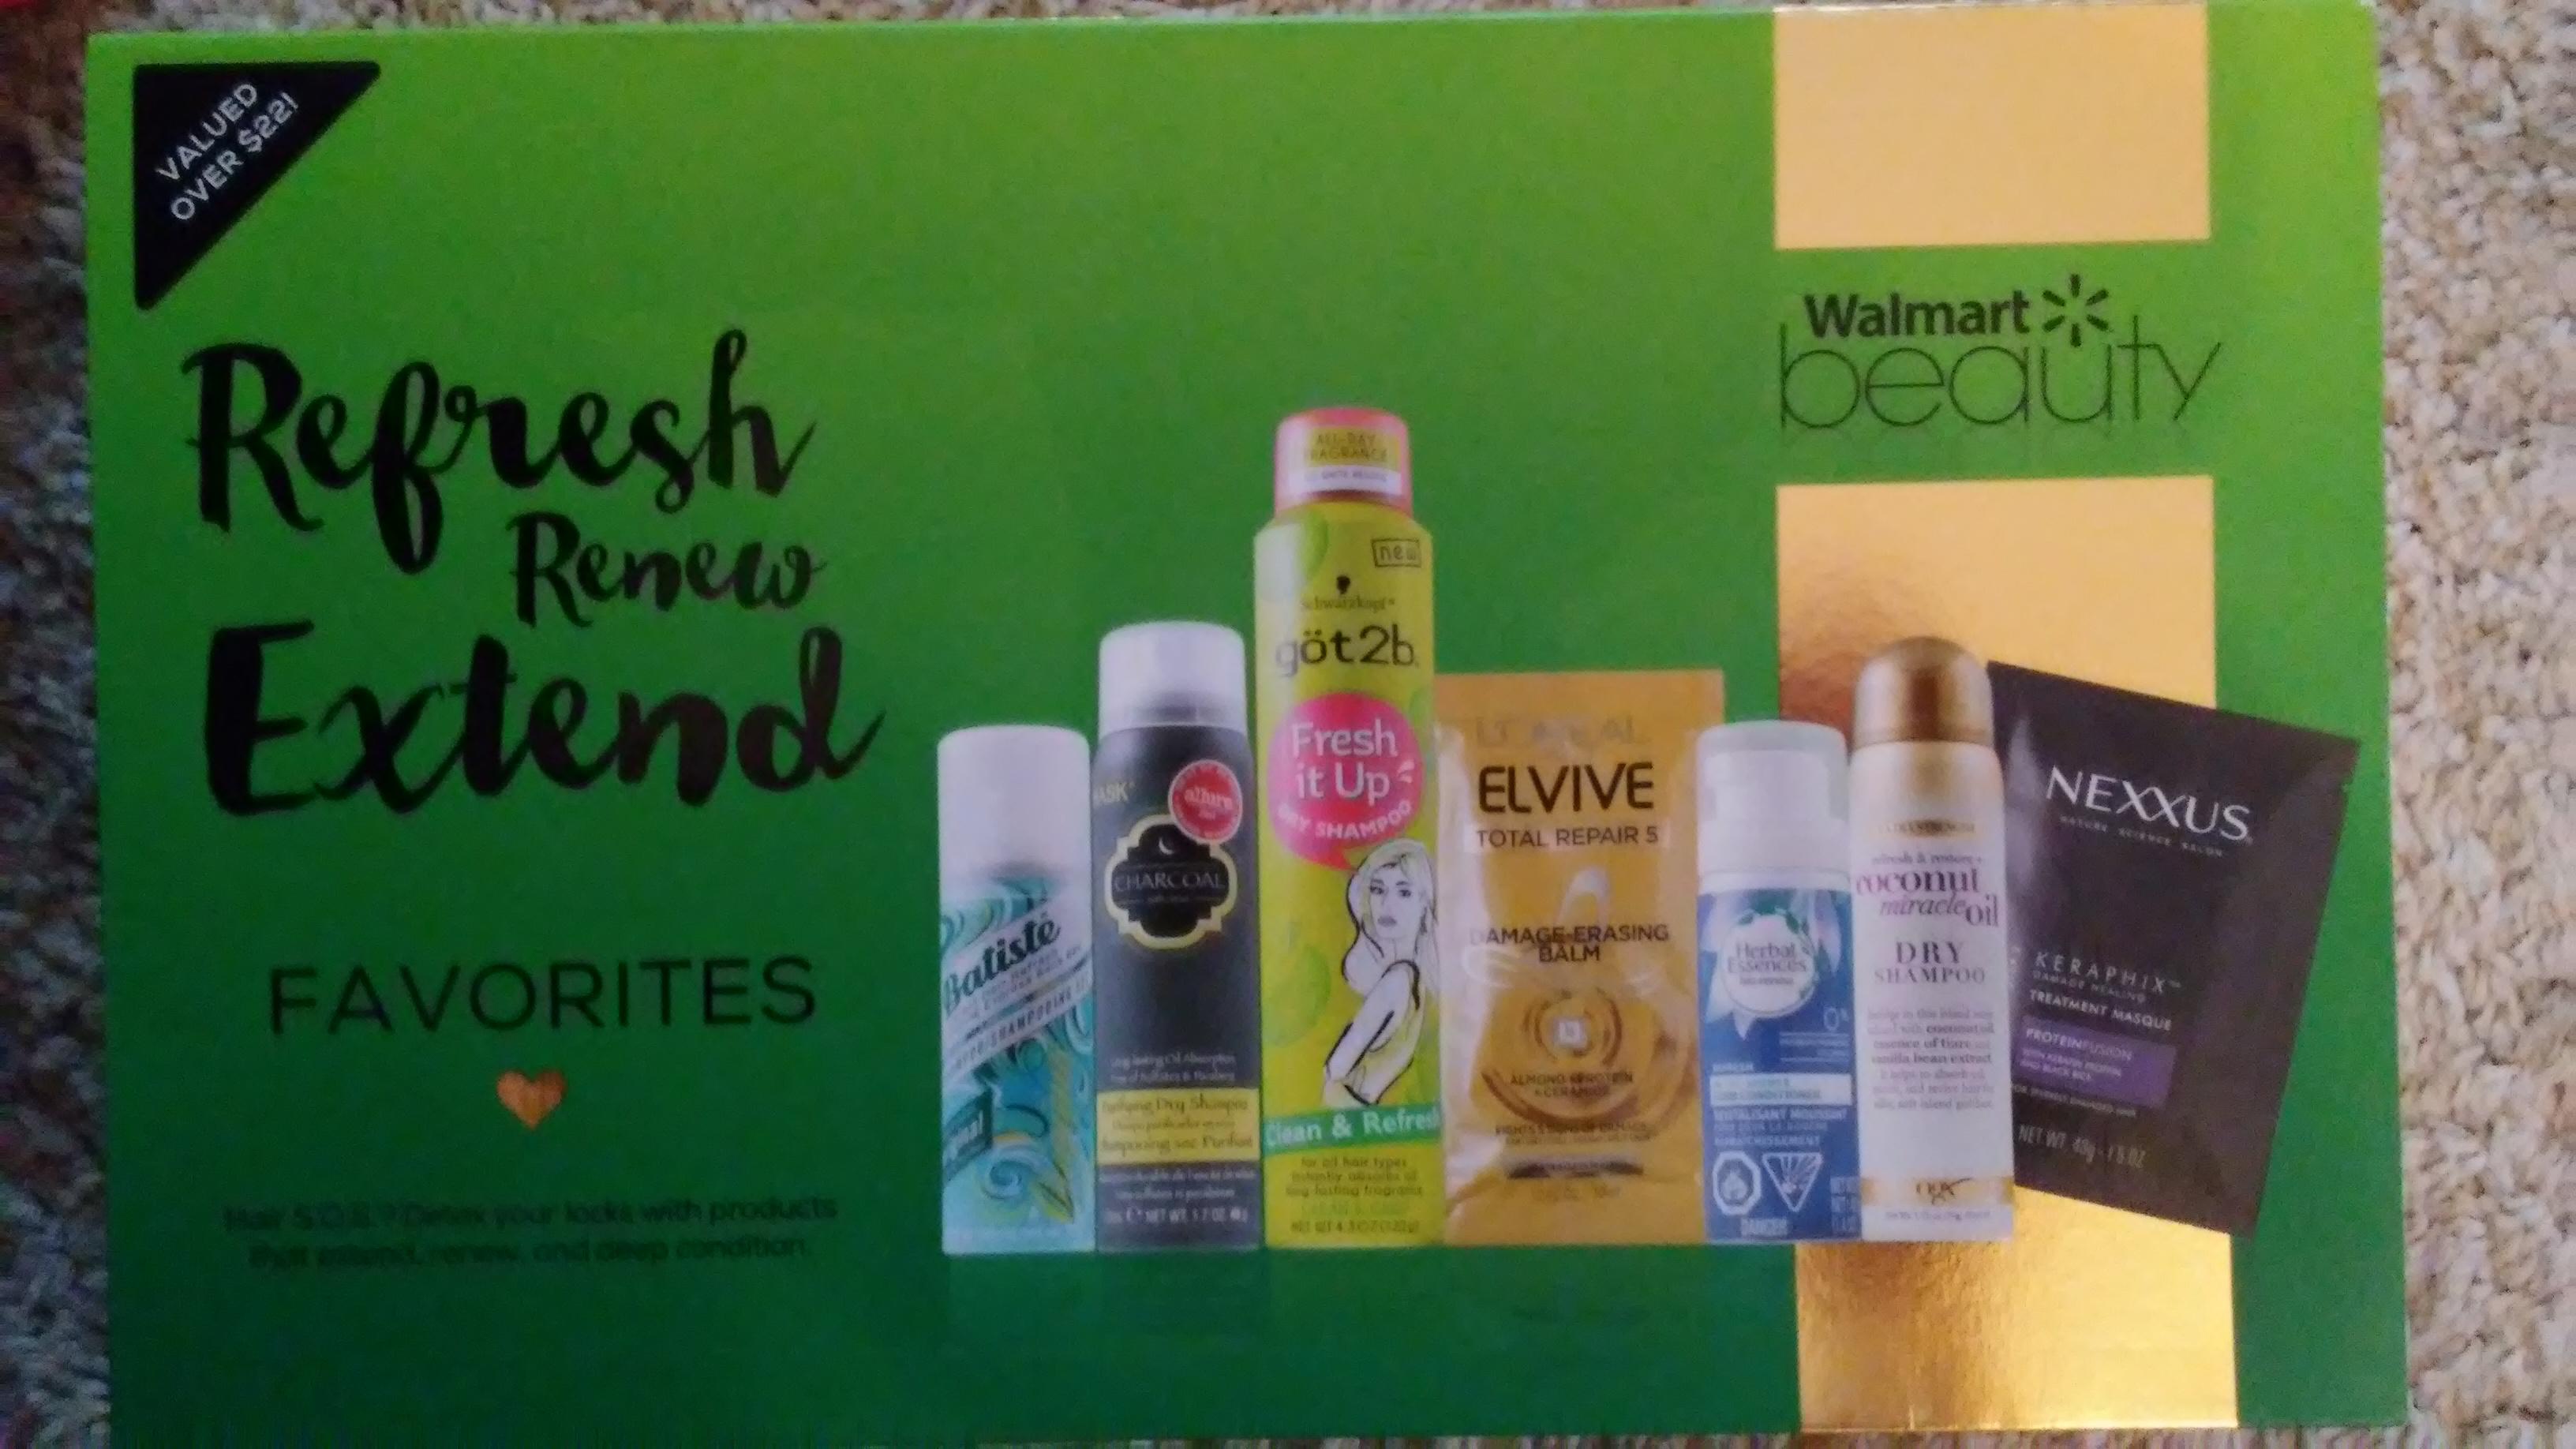 Walmart Favorites beauty boxes $5